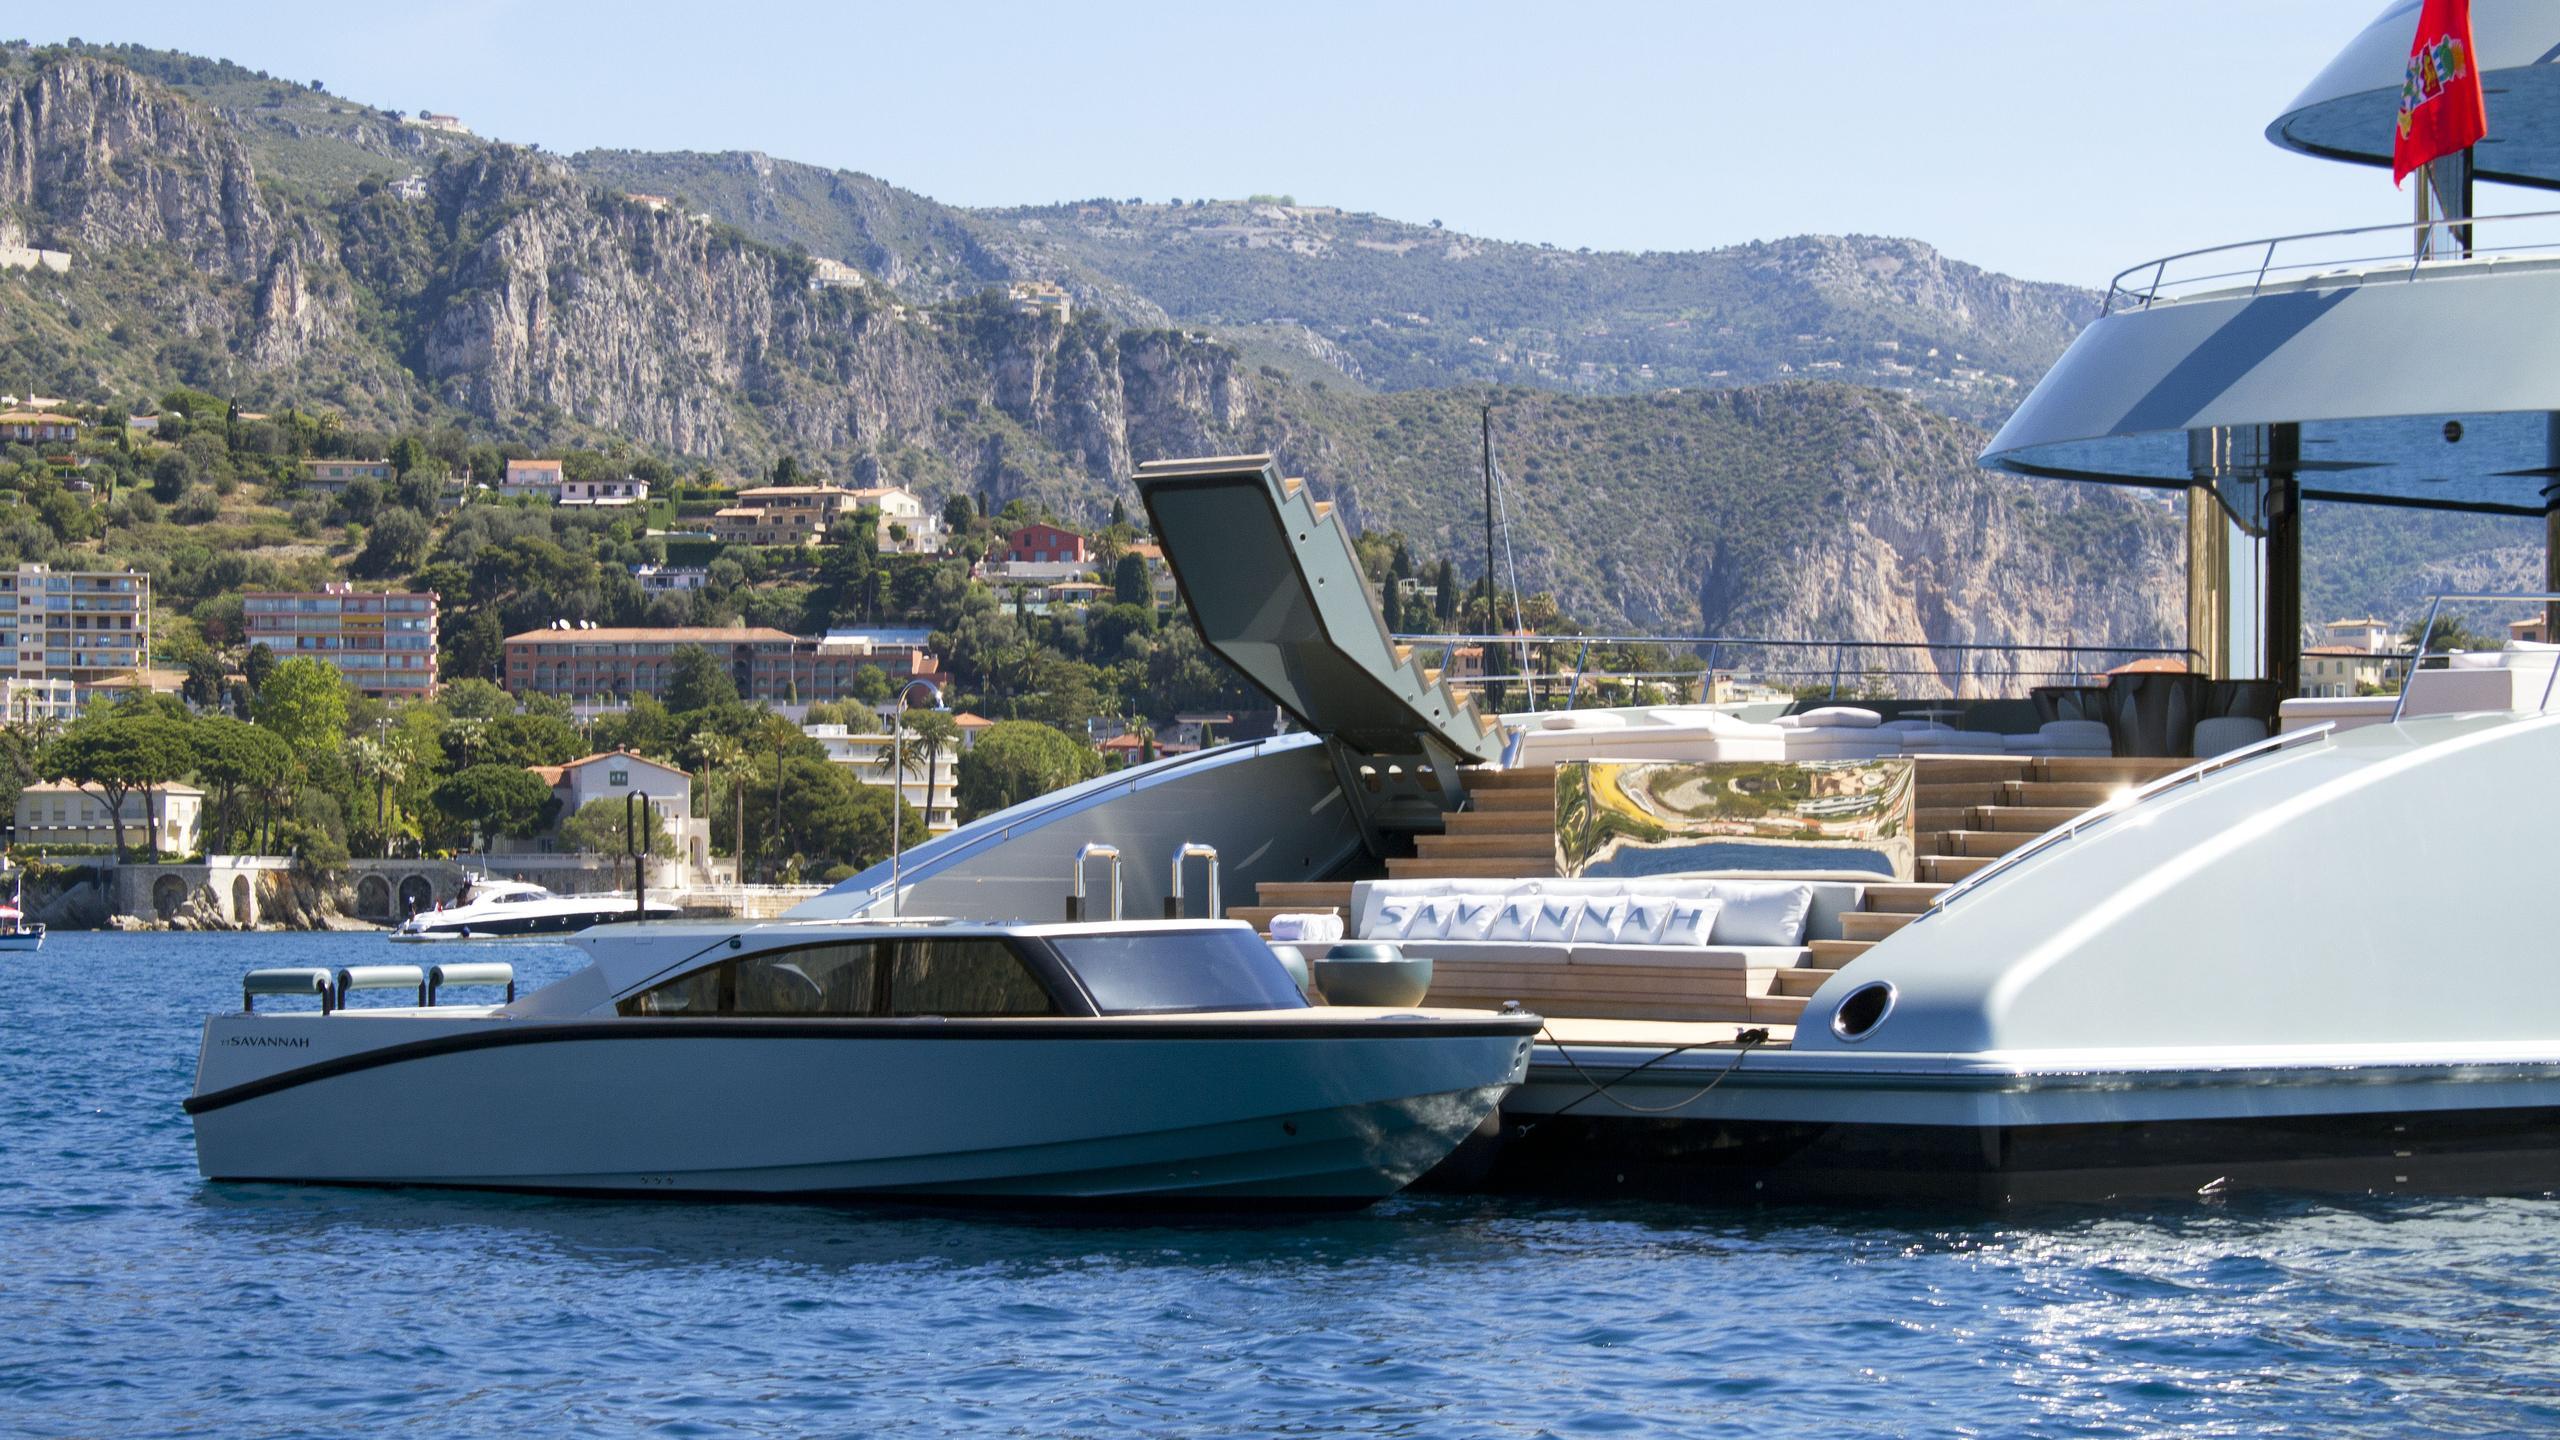 Savannah-motor-yacht-feadship-2015-83m-stern-and-tender